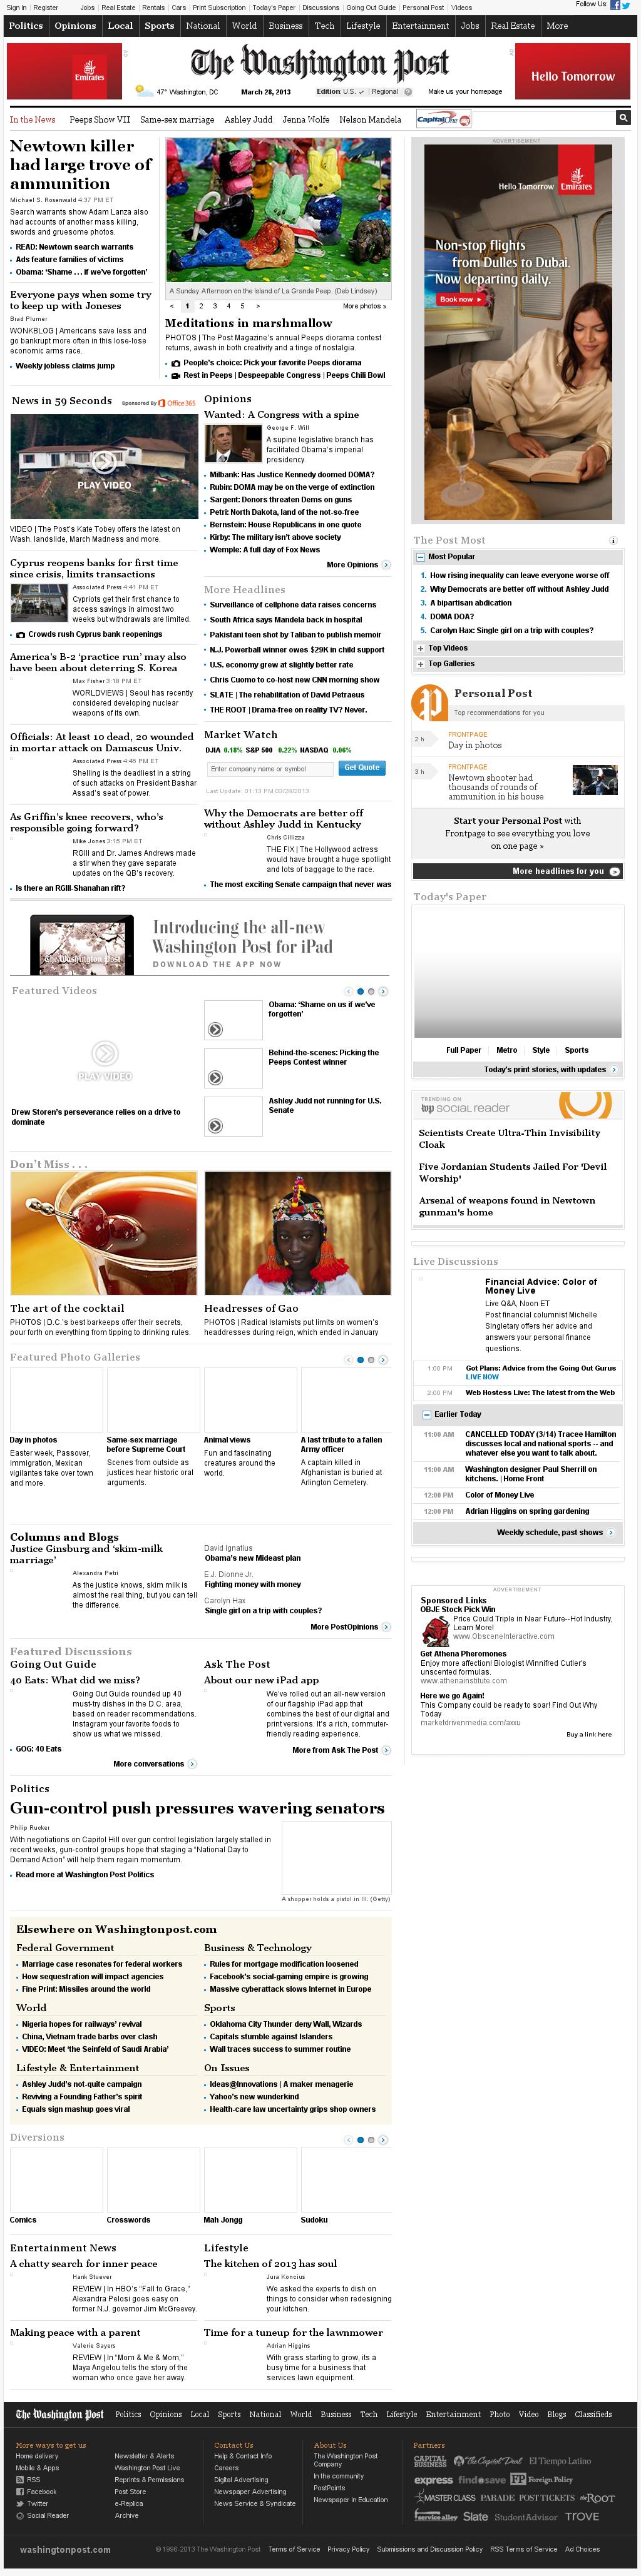 The Washington Post at Thursday March 28, 2013, 5:24 p.m. UTC